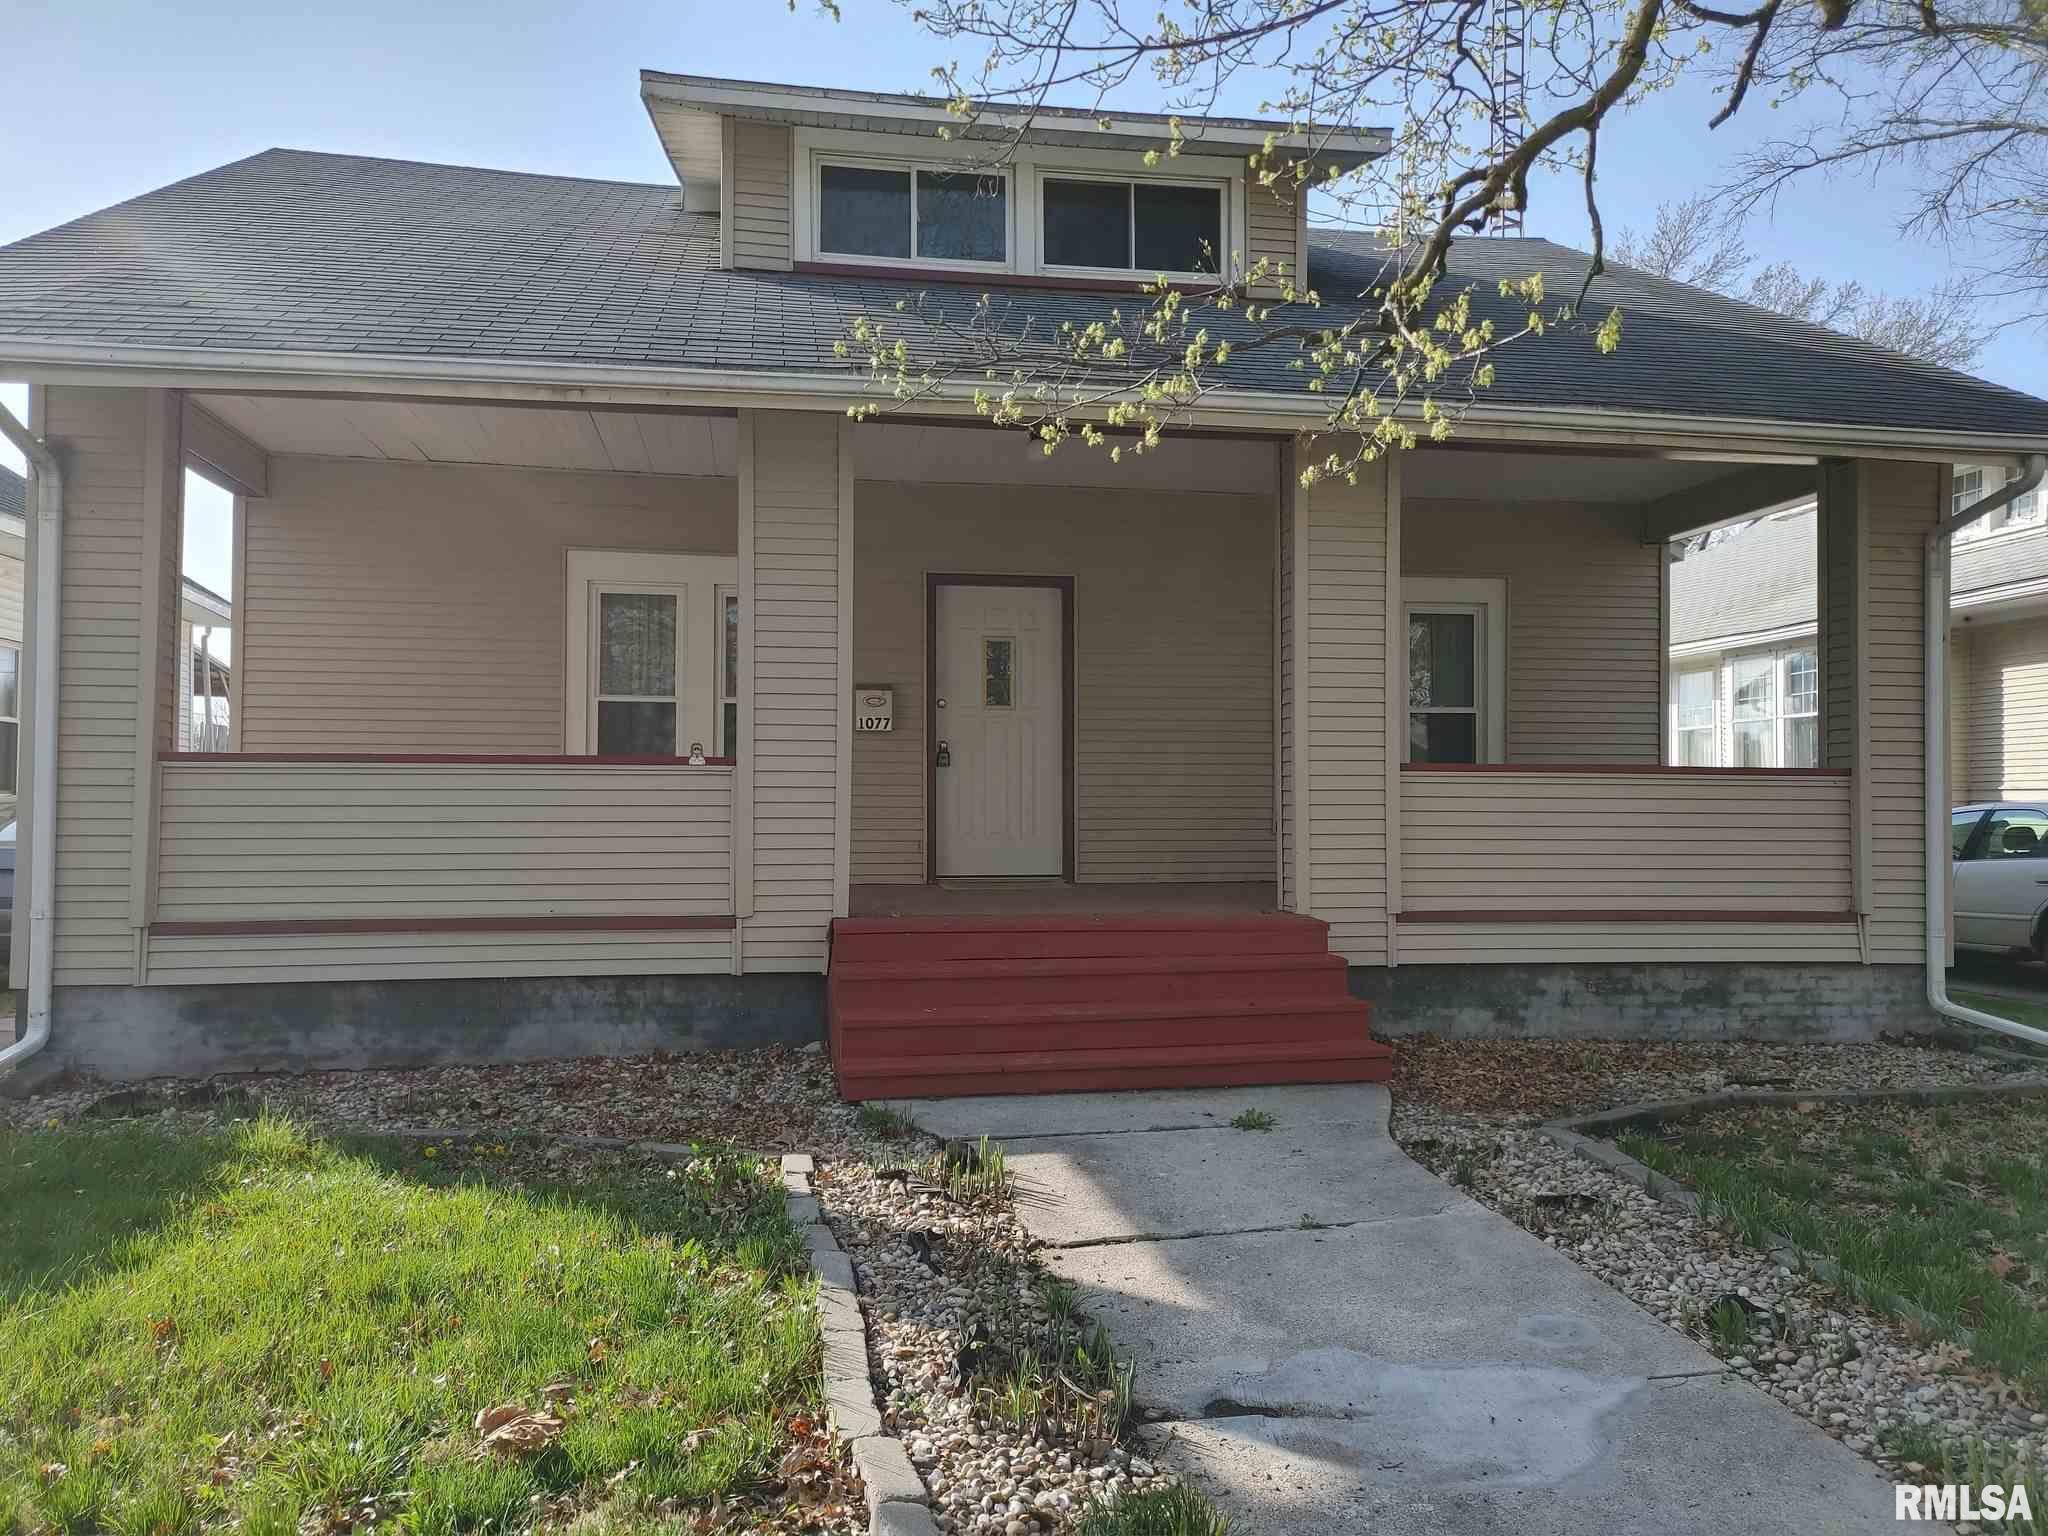 1077 N CRAFFORD Property Photo - Bushnell, IL real estate listing